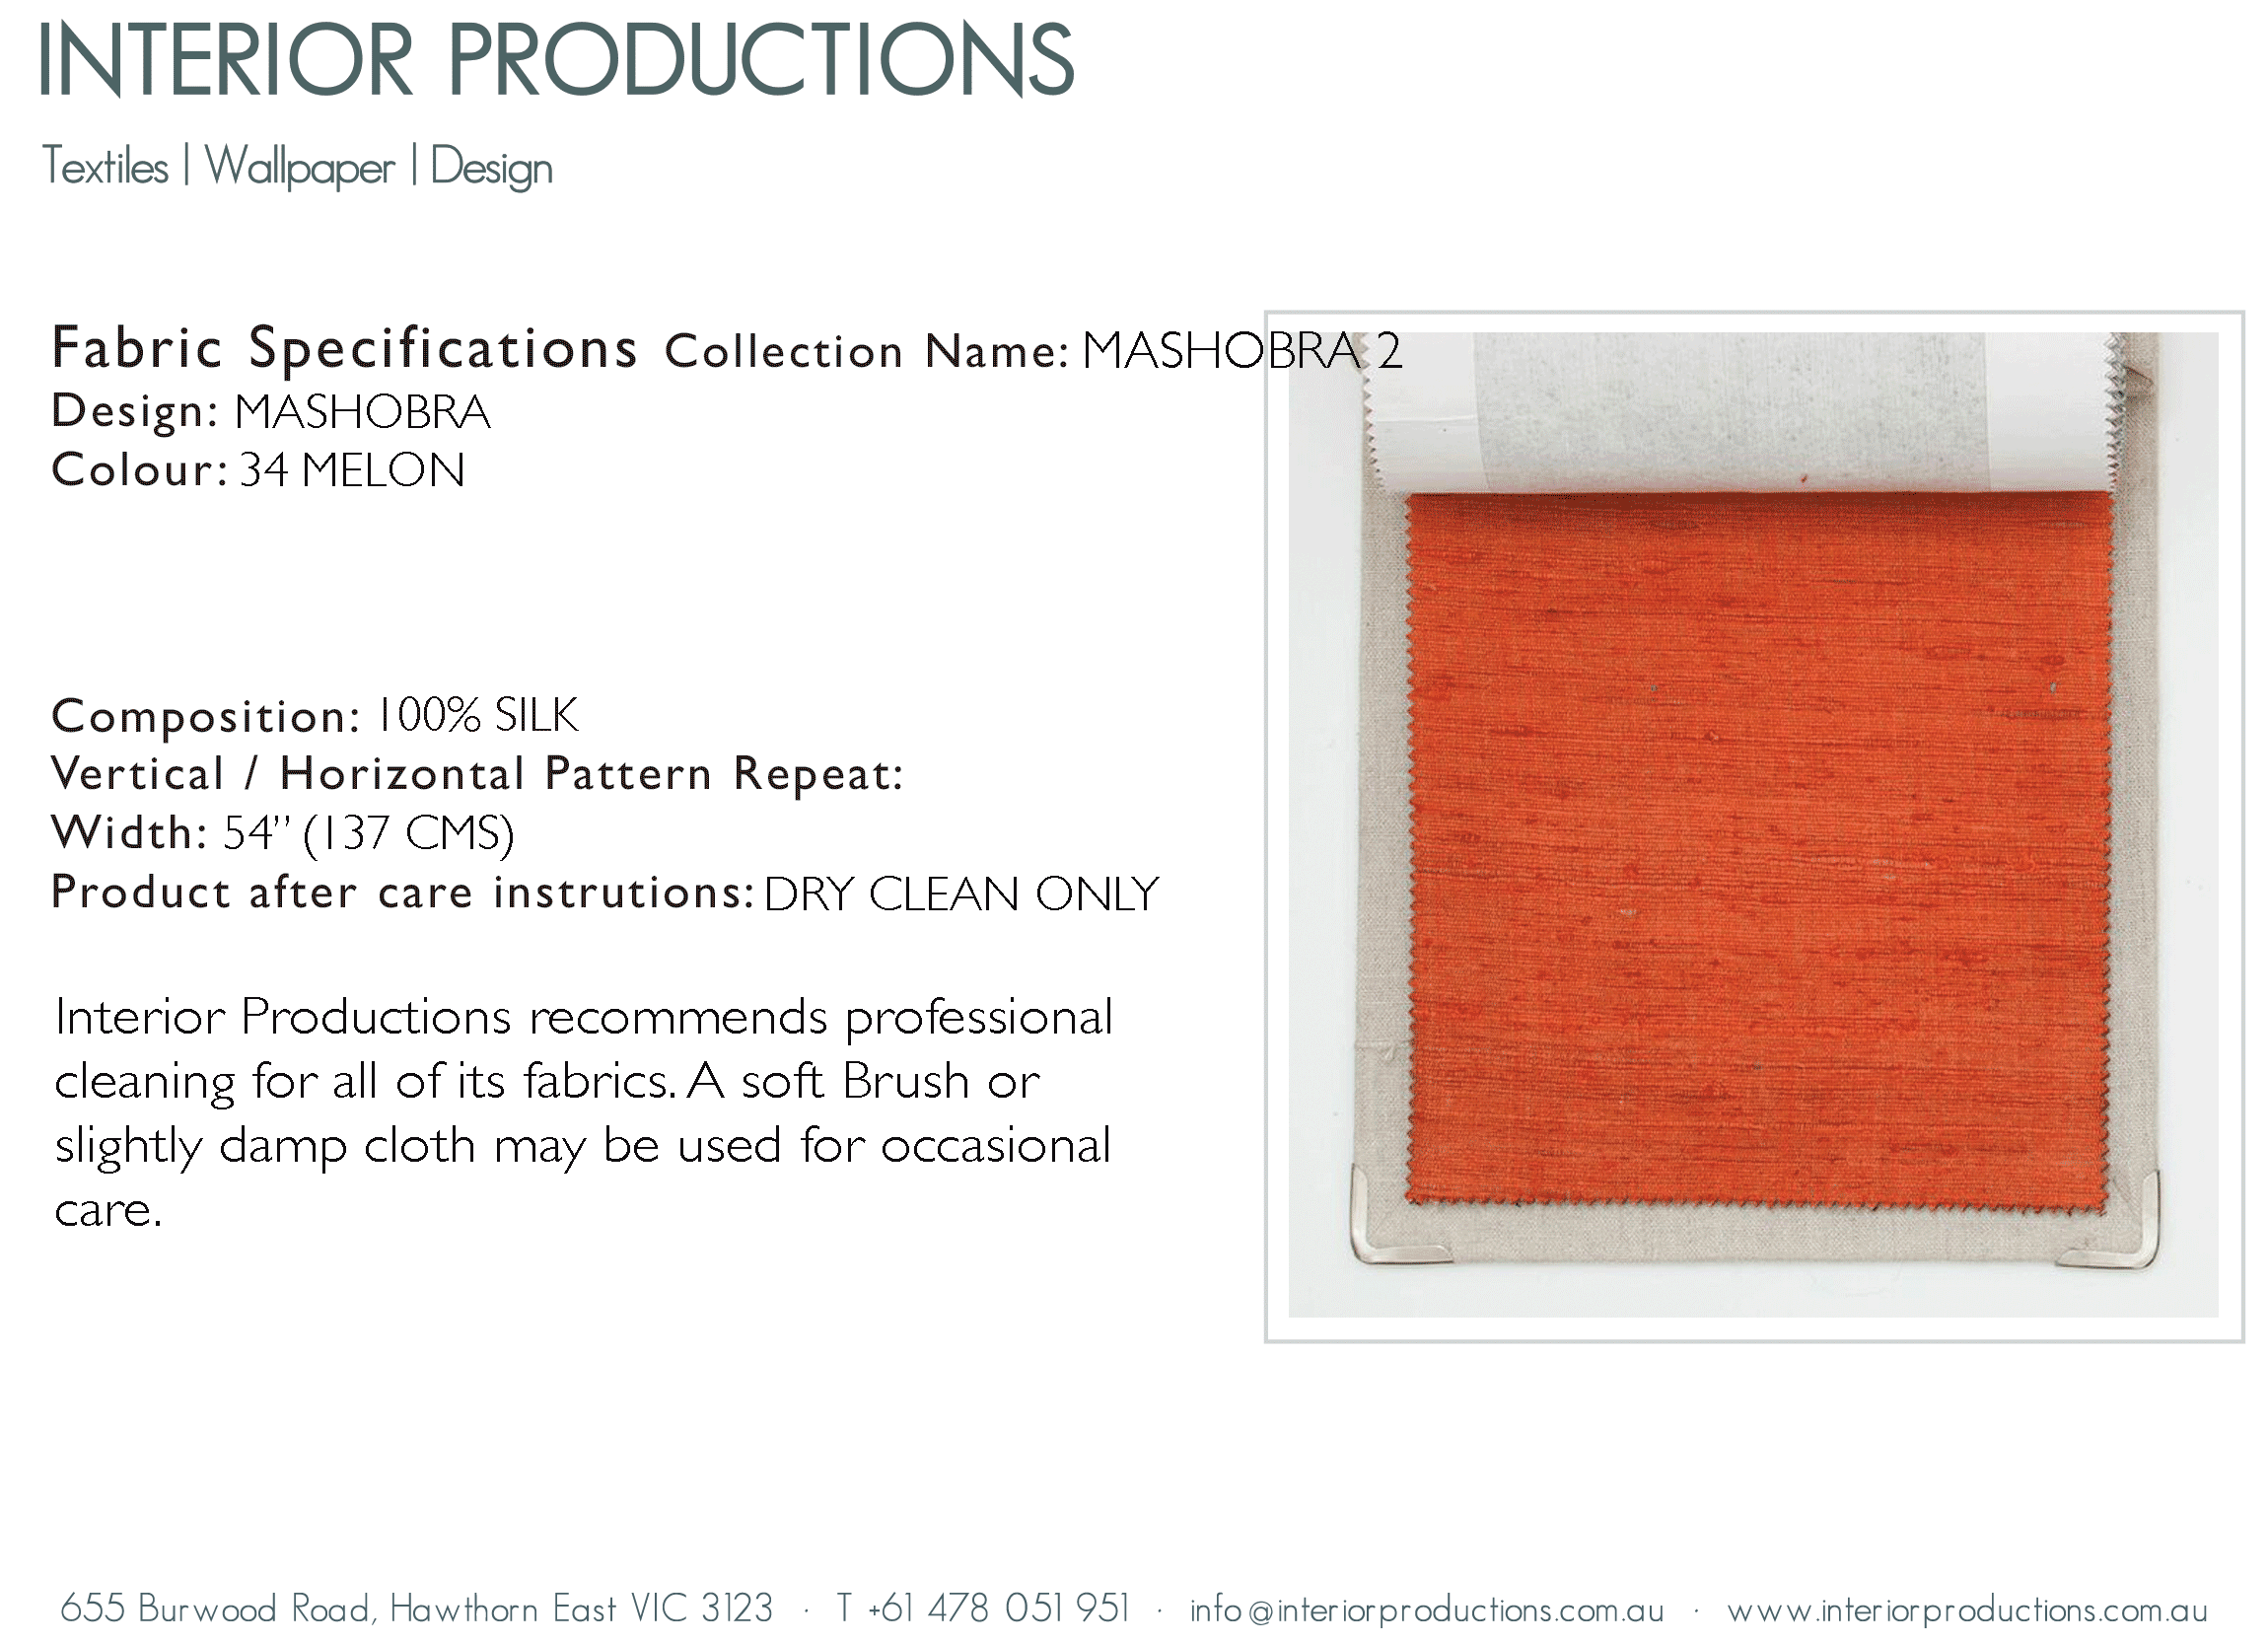 interior_productions_MASHOBRA---34-MELON